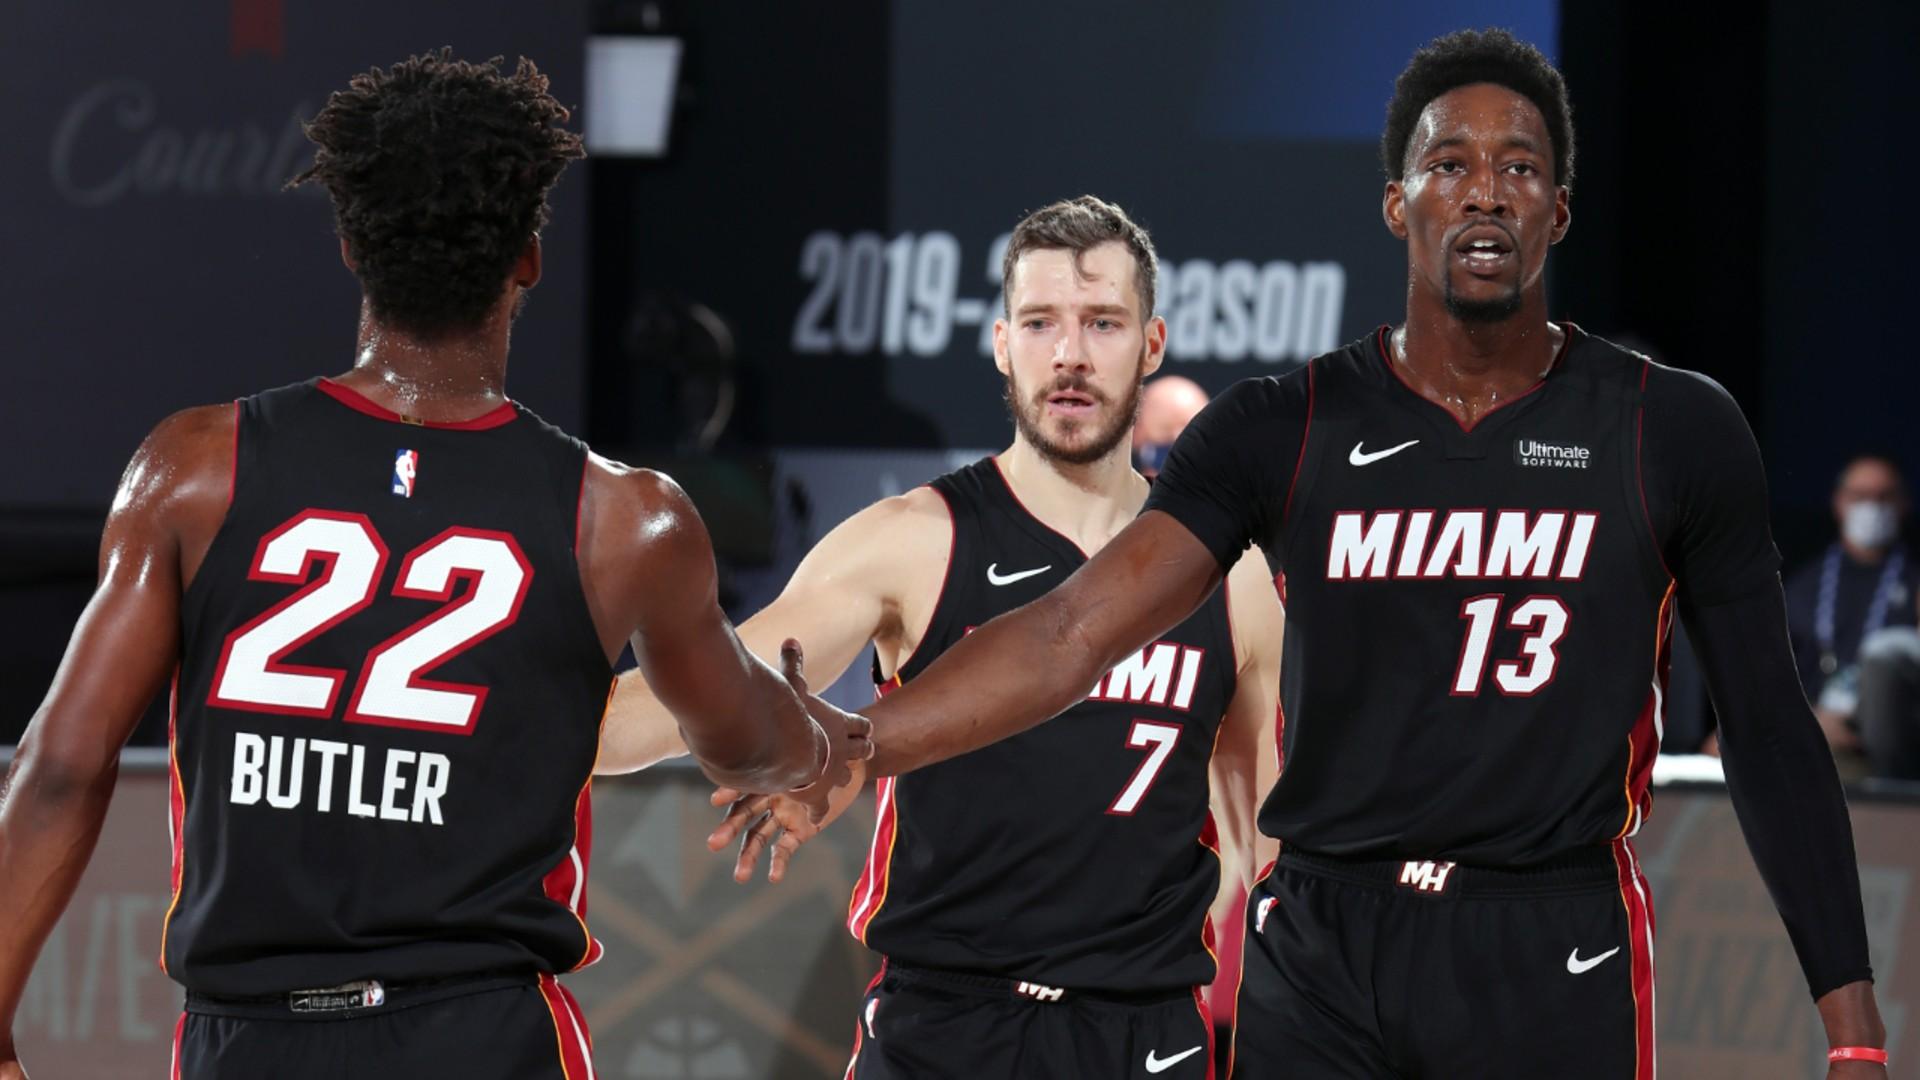 Nba Finals 2020 Injury Updates On Miami Heat S Jimmy Butler Bam Adebayo And Goran Dragic Nba Com Australia The Official Site Of The Nba